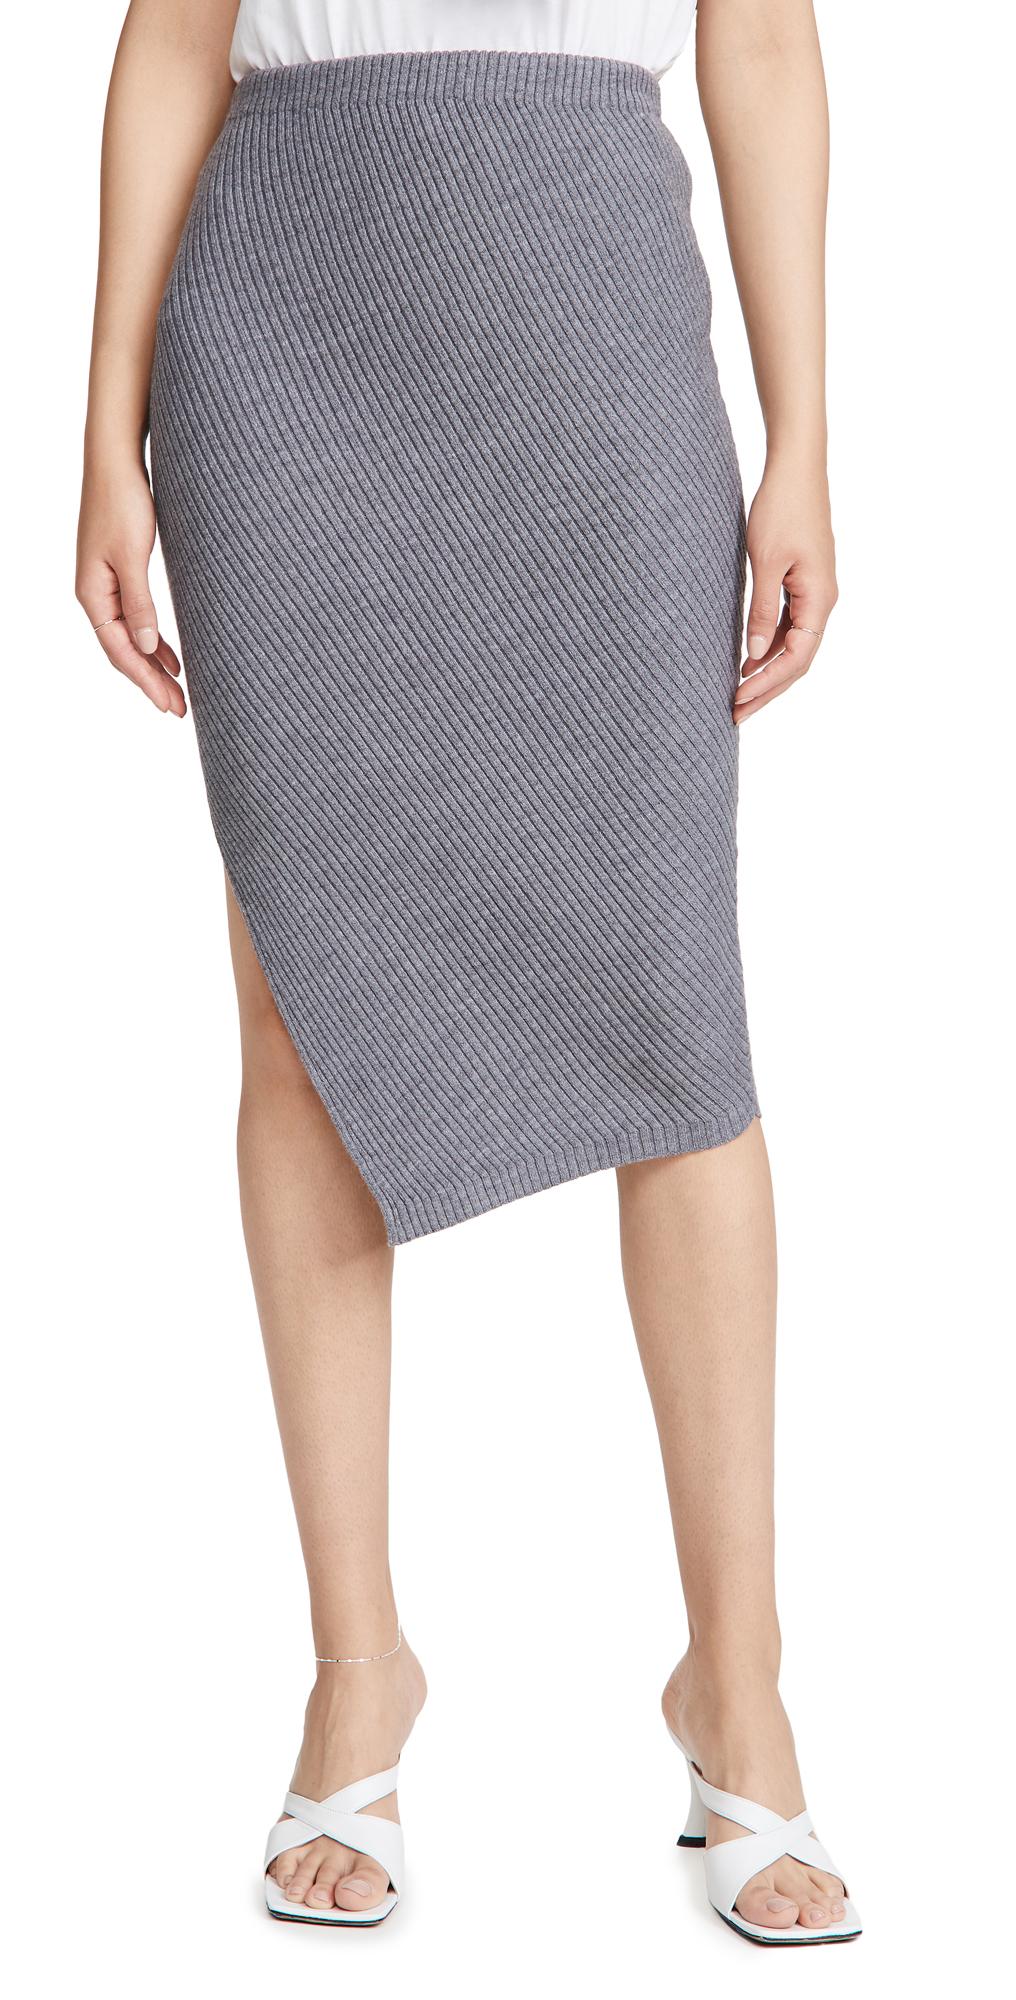 Theory Twisted Rib Skirt